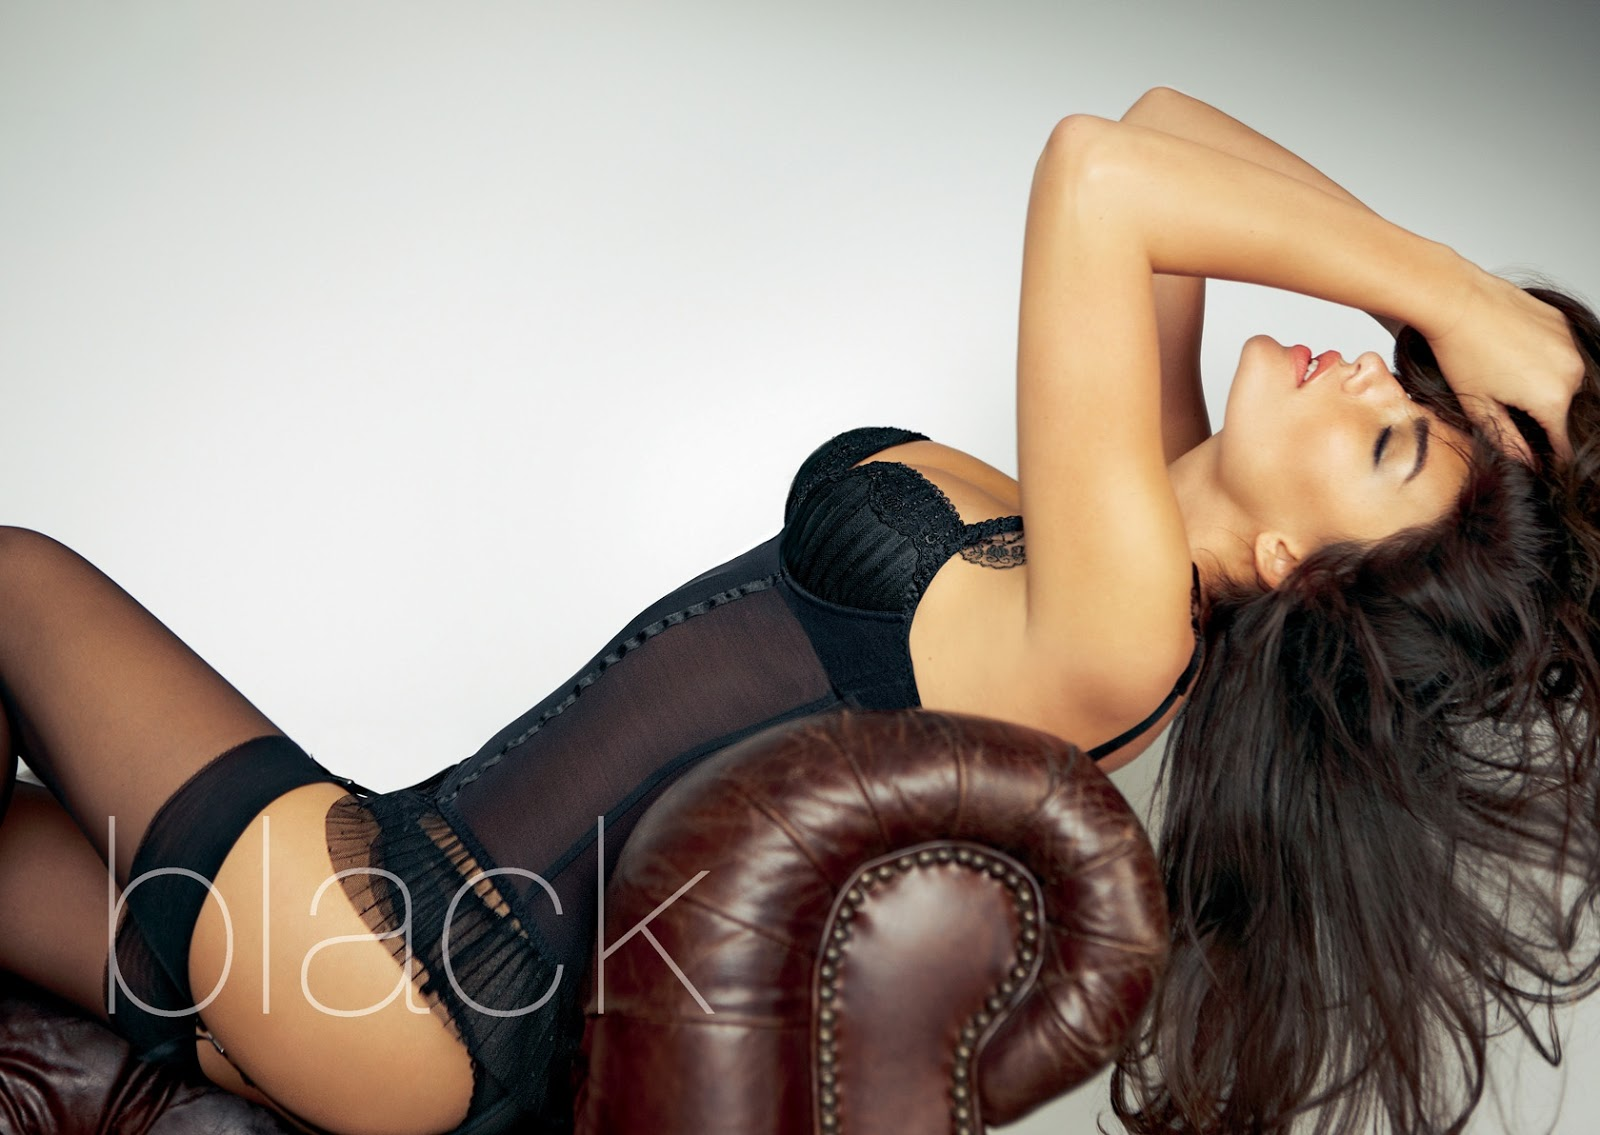 http://3.bp.blogspot.com/-S5Gs-P3utAQ/UVvnwX5cr8I/AAAAAAAAB58/XPHrVSAZOu0/s1600/Alyssa-Miller-Intimissimi-lingerie-10.jpg